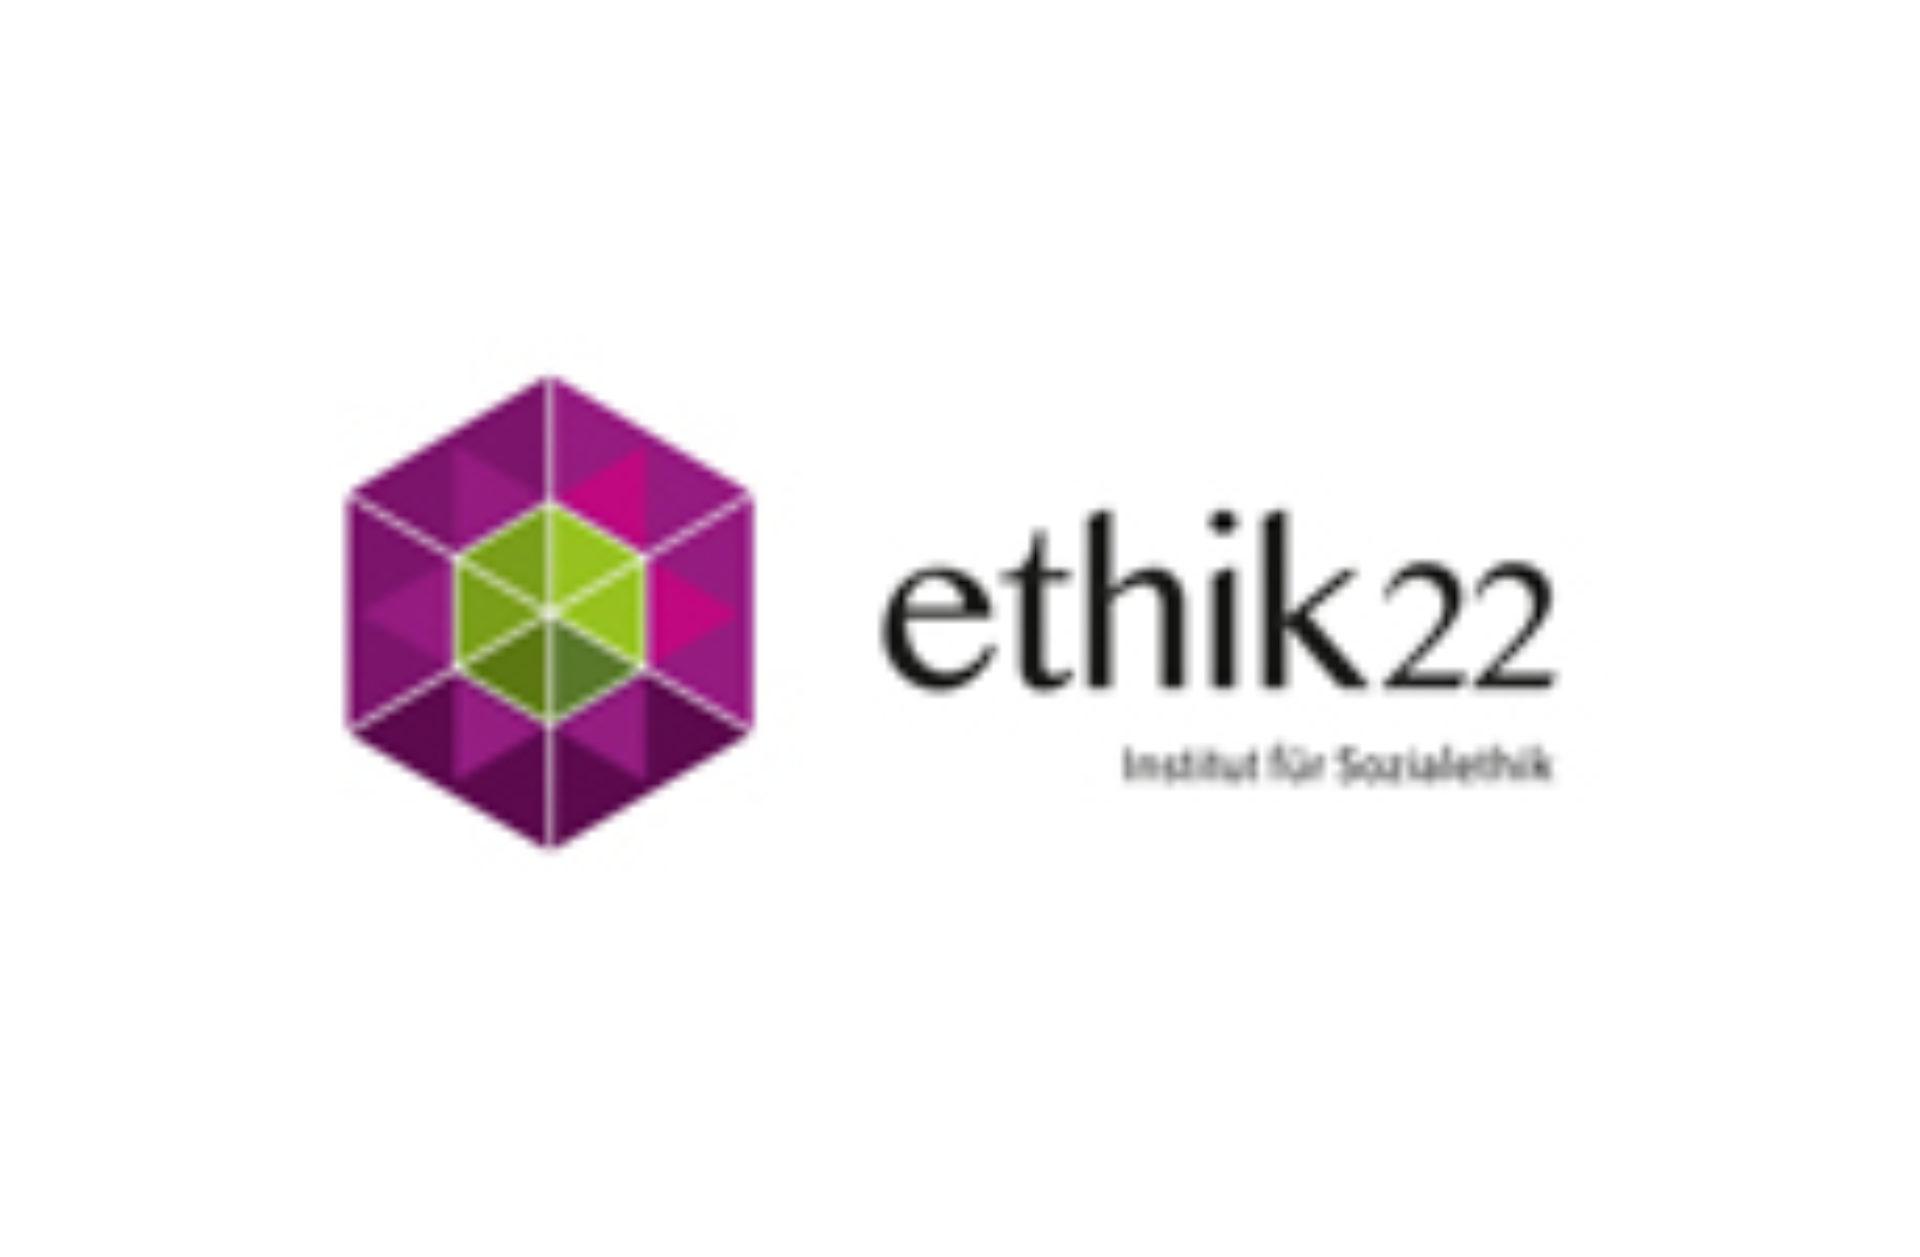 ethik22